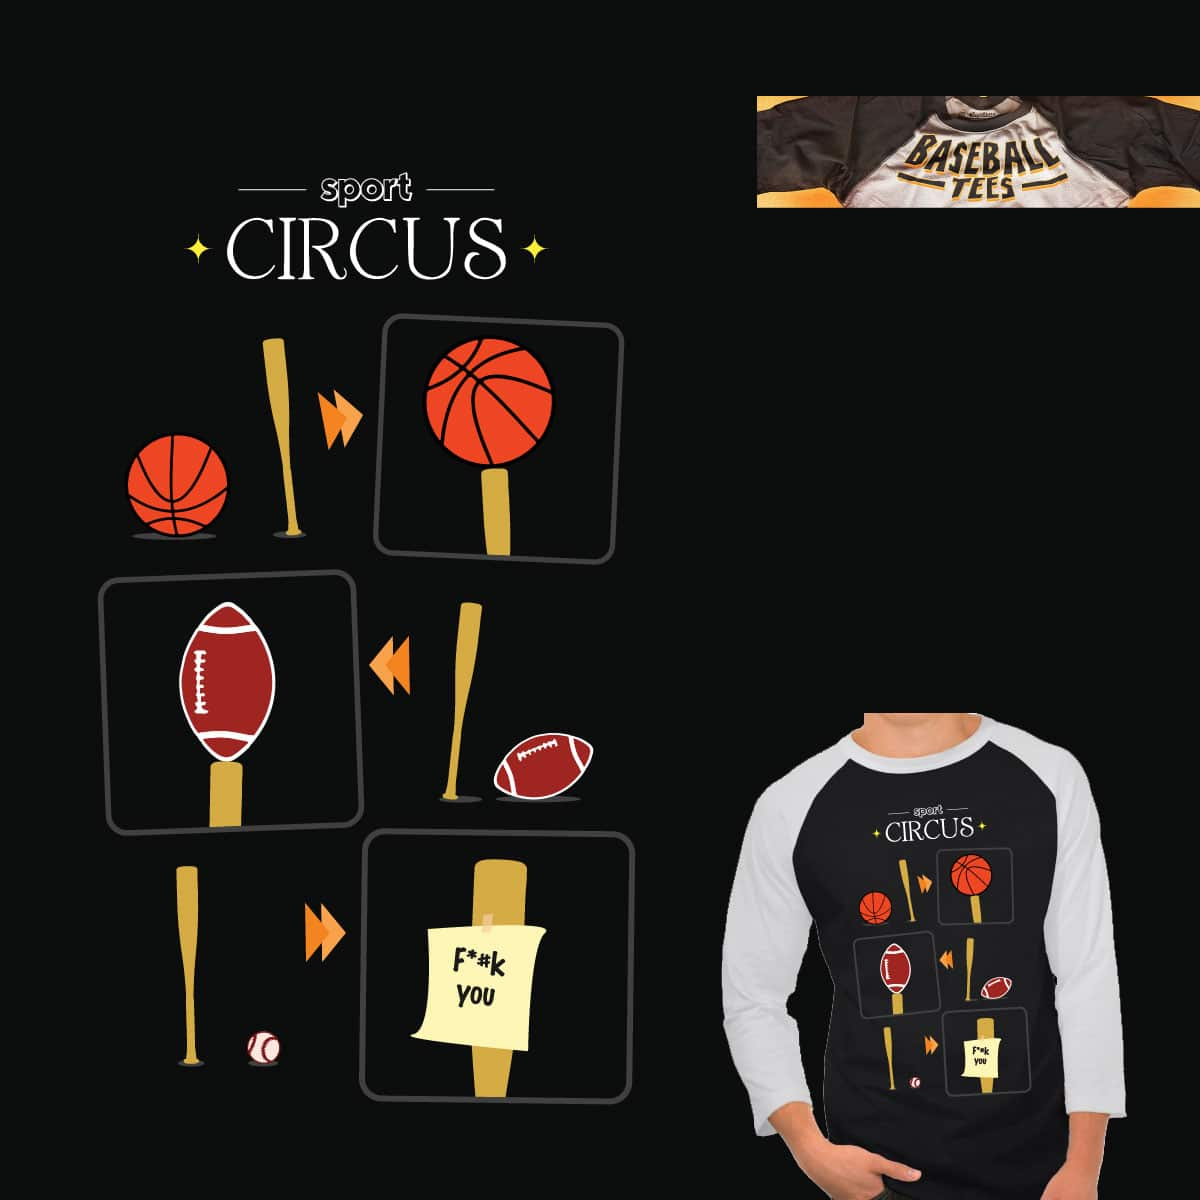 Sport Circus by johnstfernandezbe on Threadless